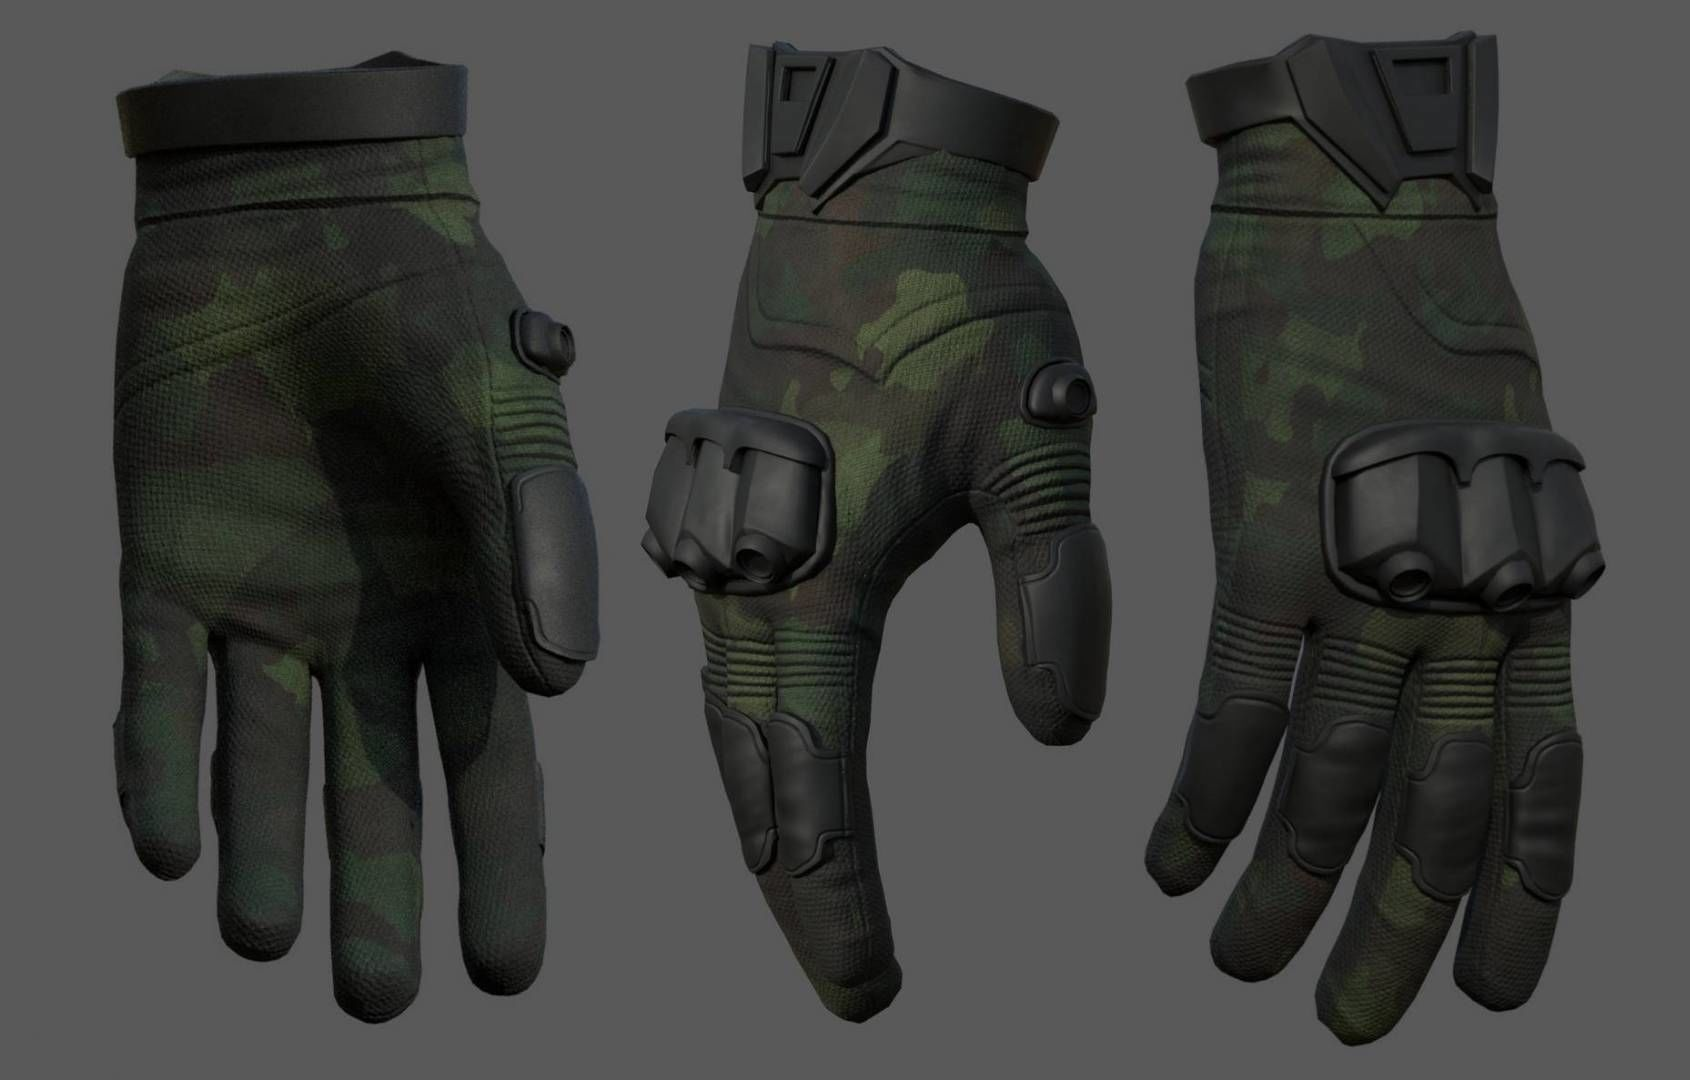 gloves-military-combat-soldier-armor-scifi-fantasy-3d-model-low-poly-obj-mtl-fbx-ma-mb | 3d artist